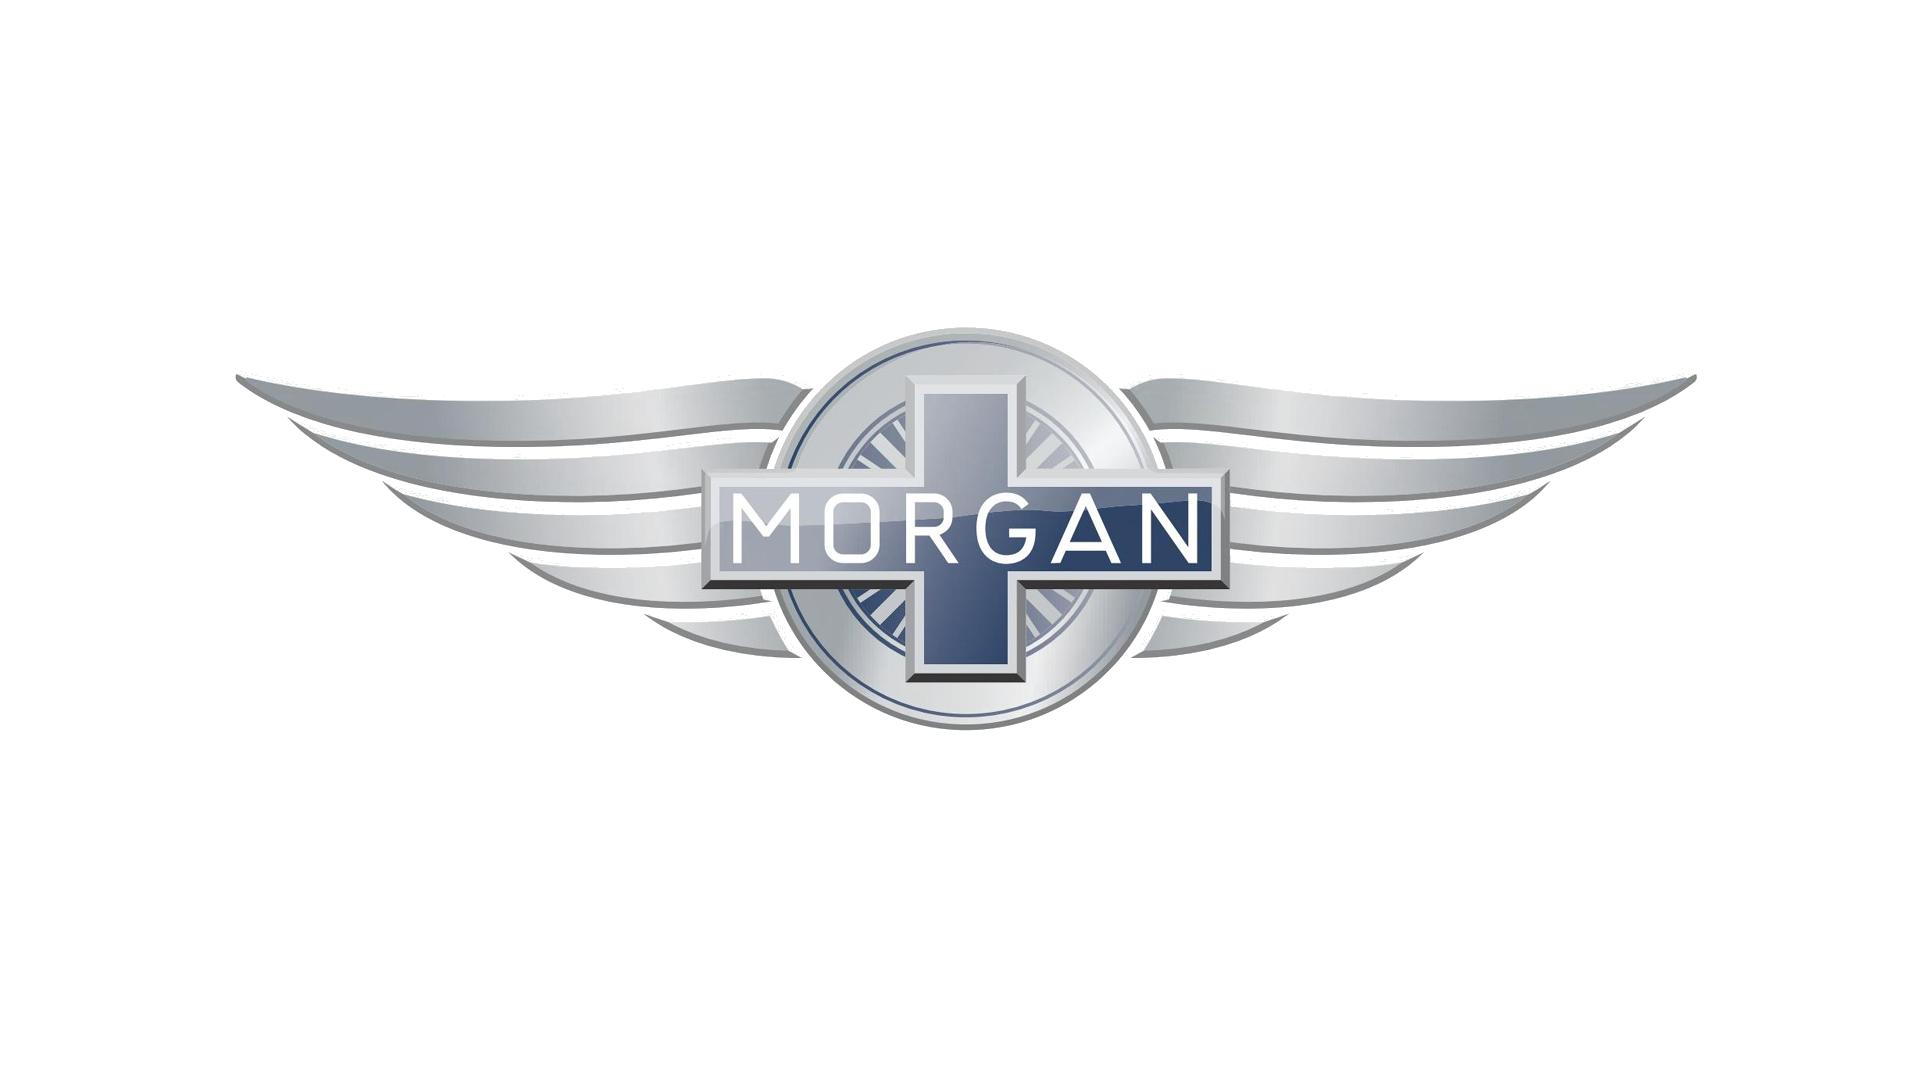 morgan_2-1